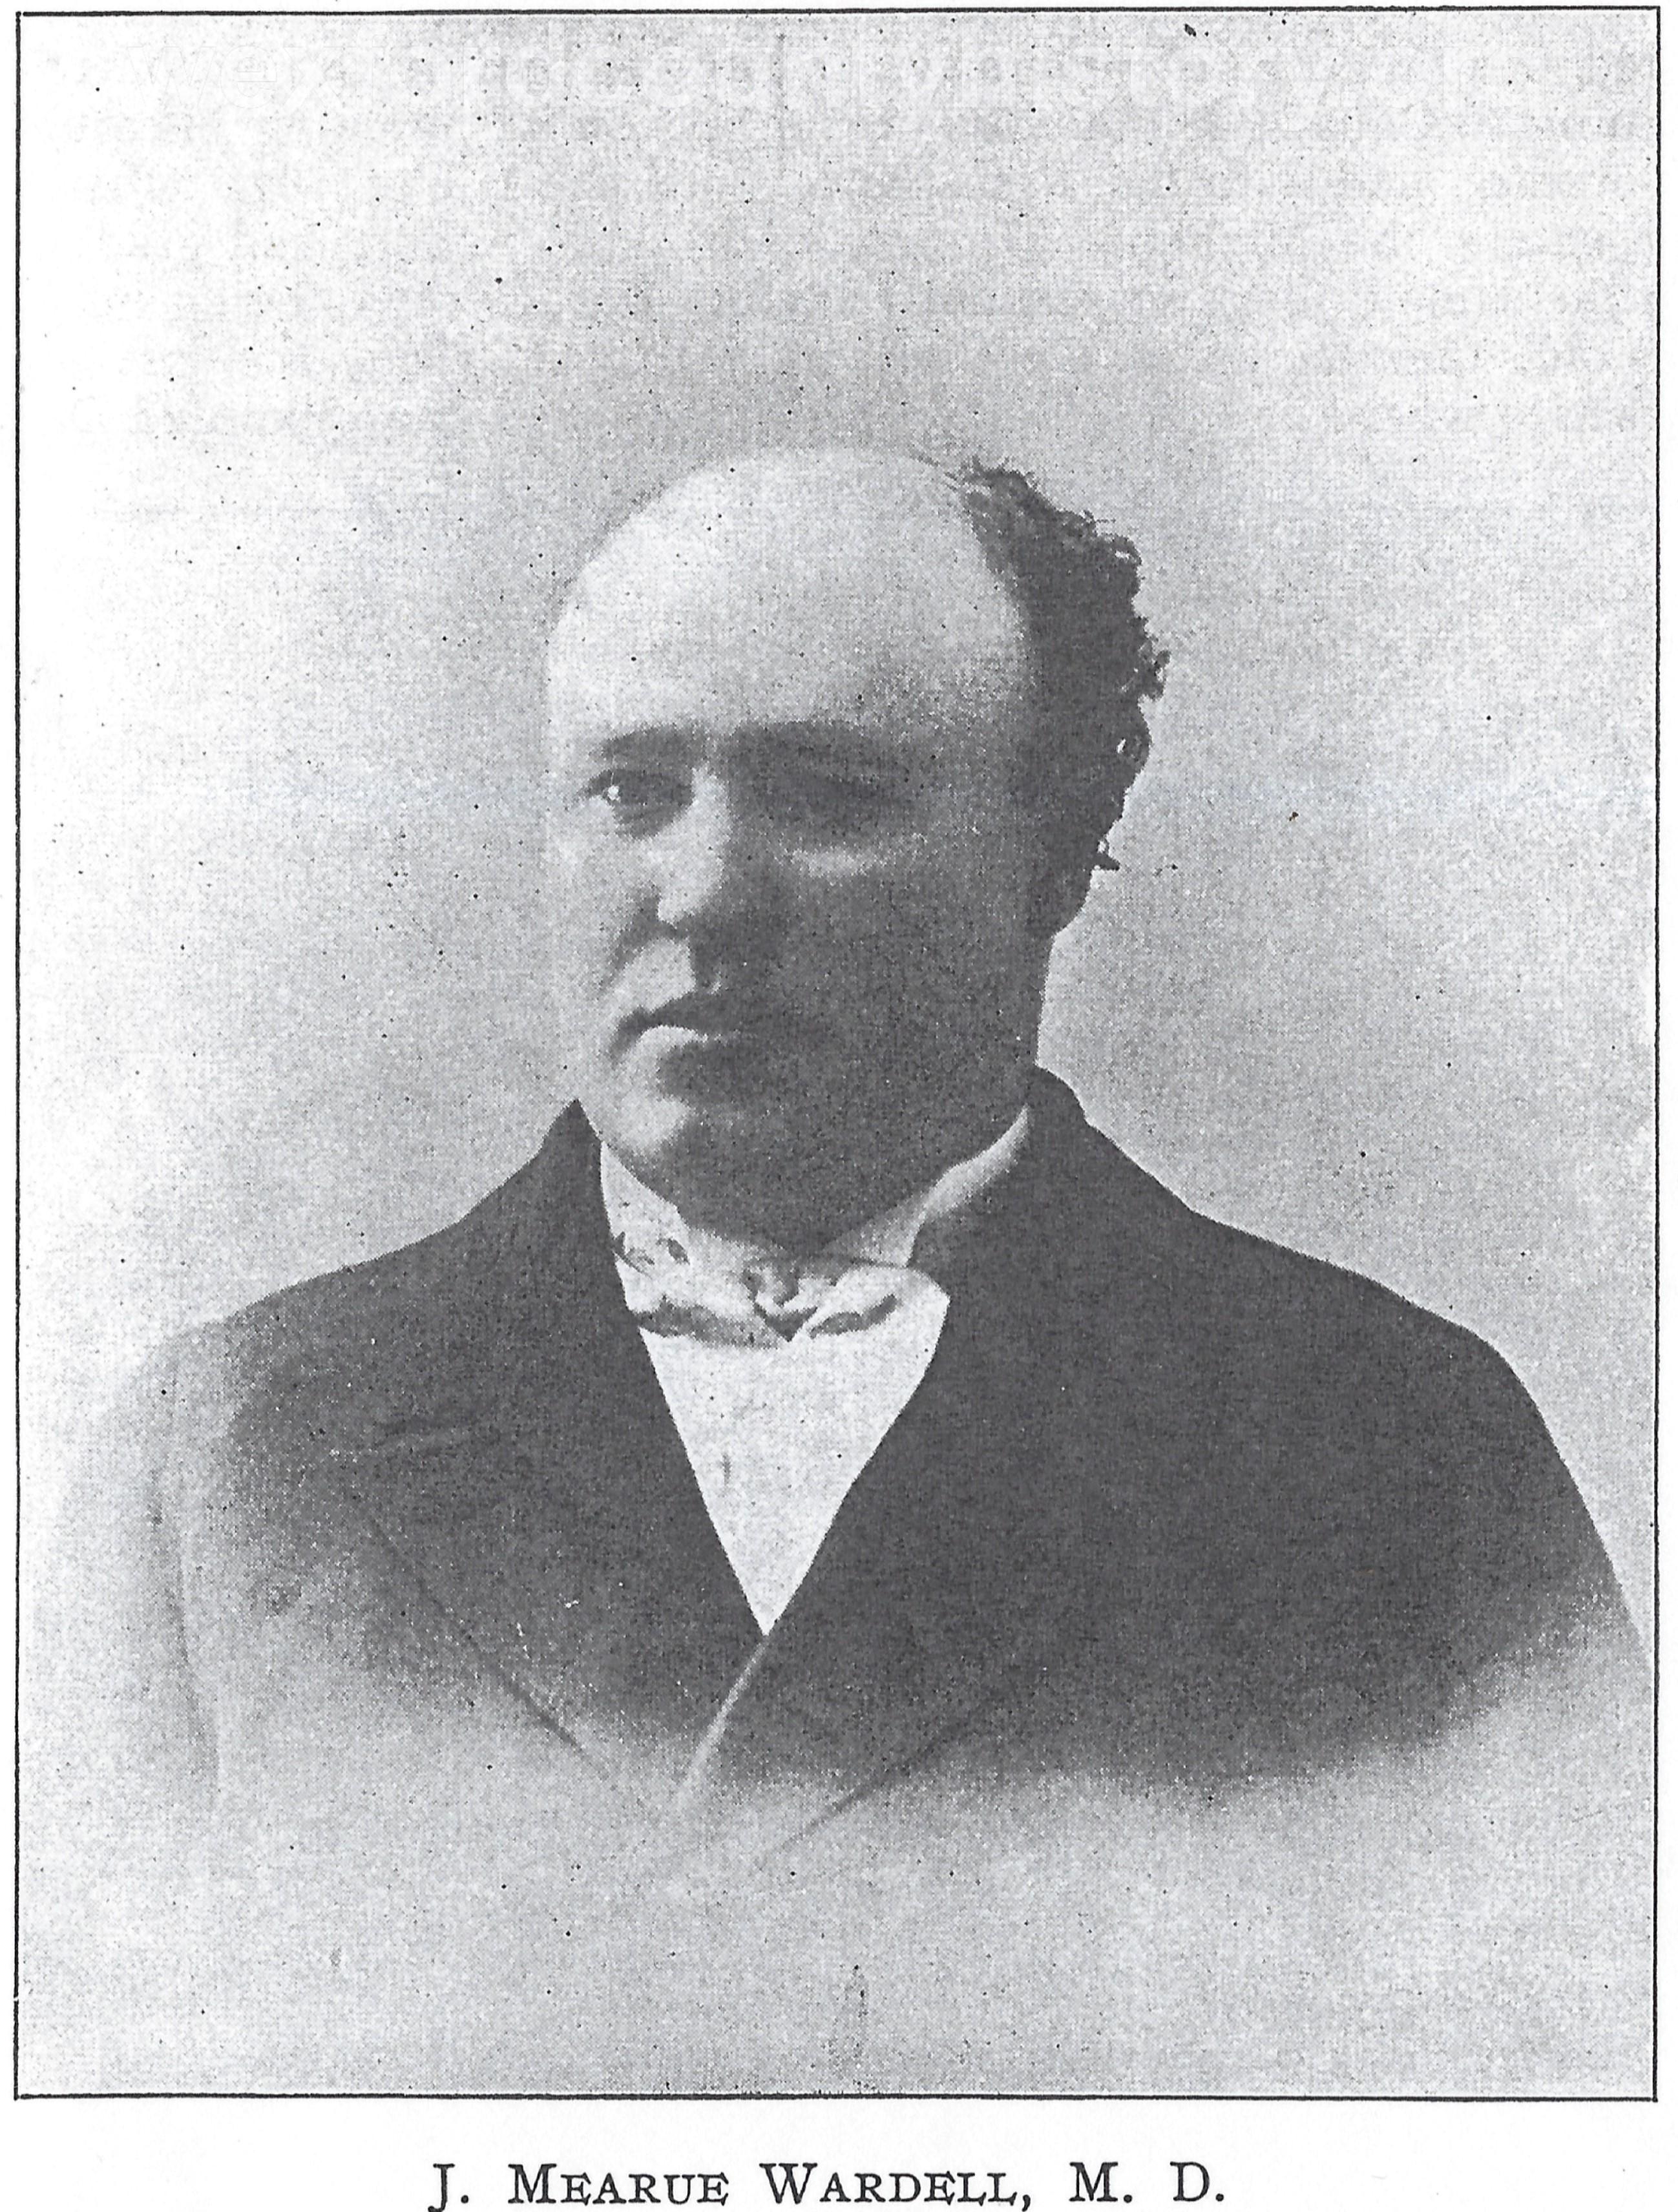 Dr. Joshua Wardell